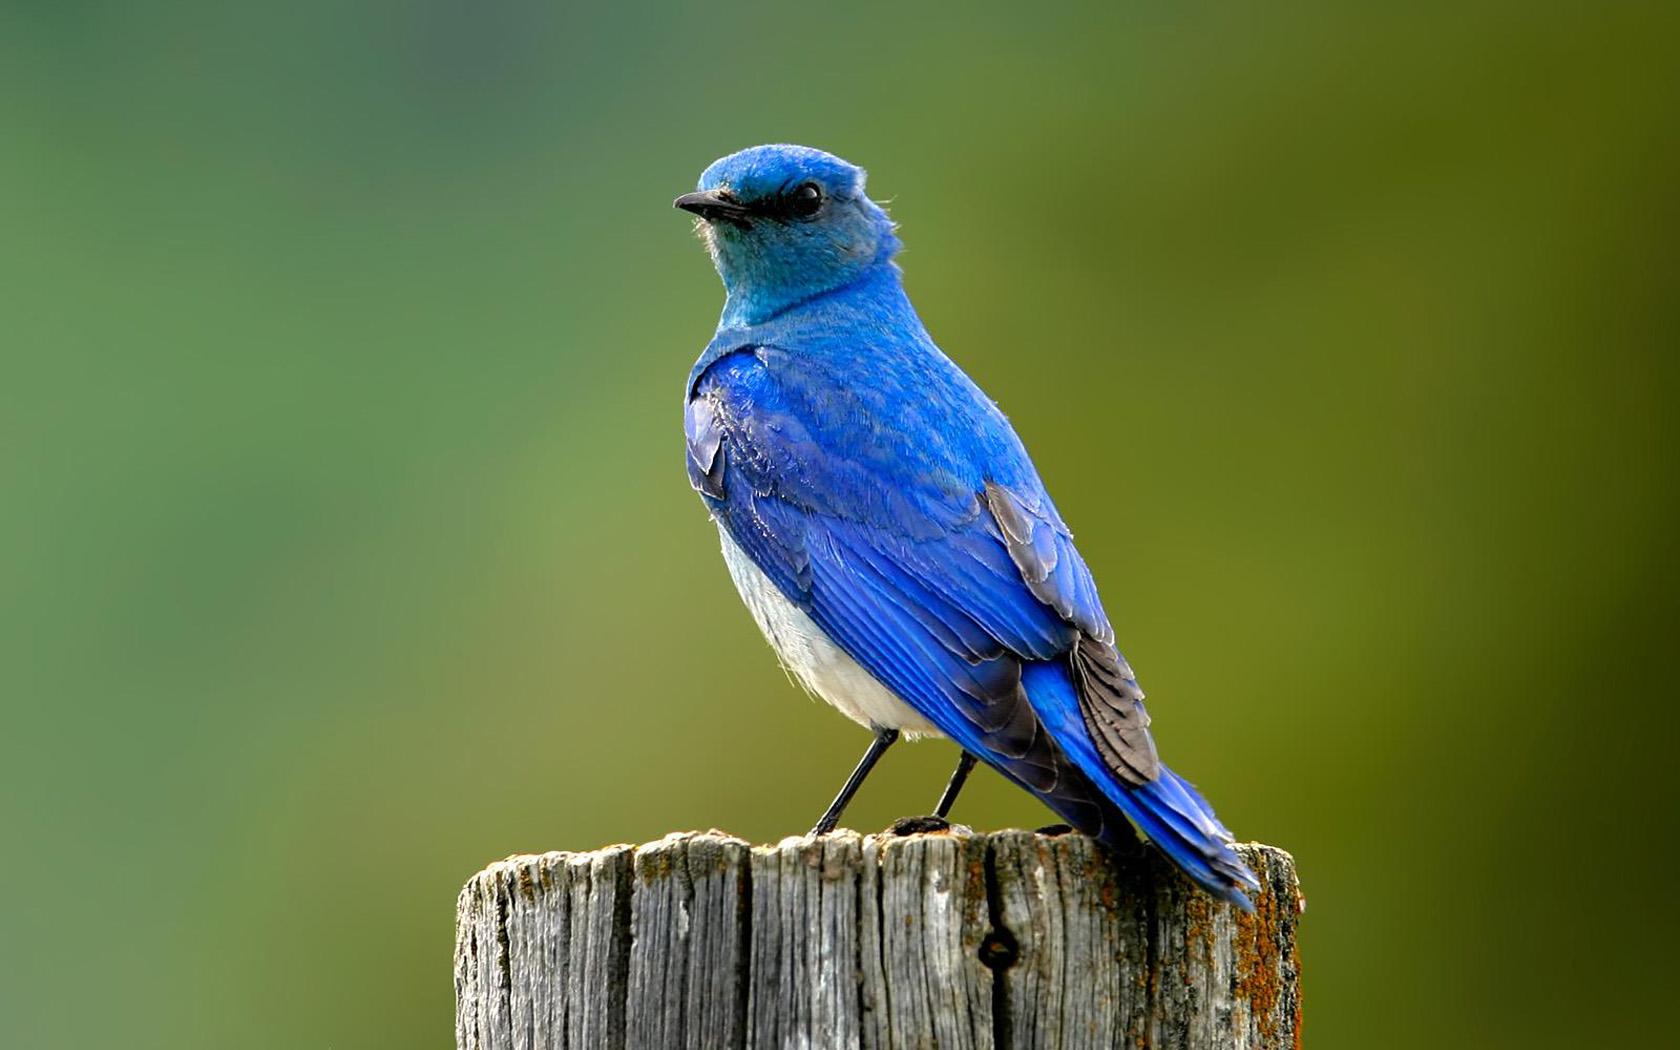 آزمون کوکولوژی پرنده آبی